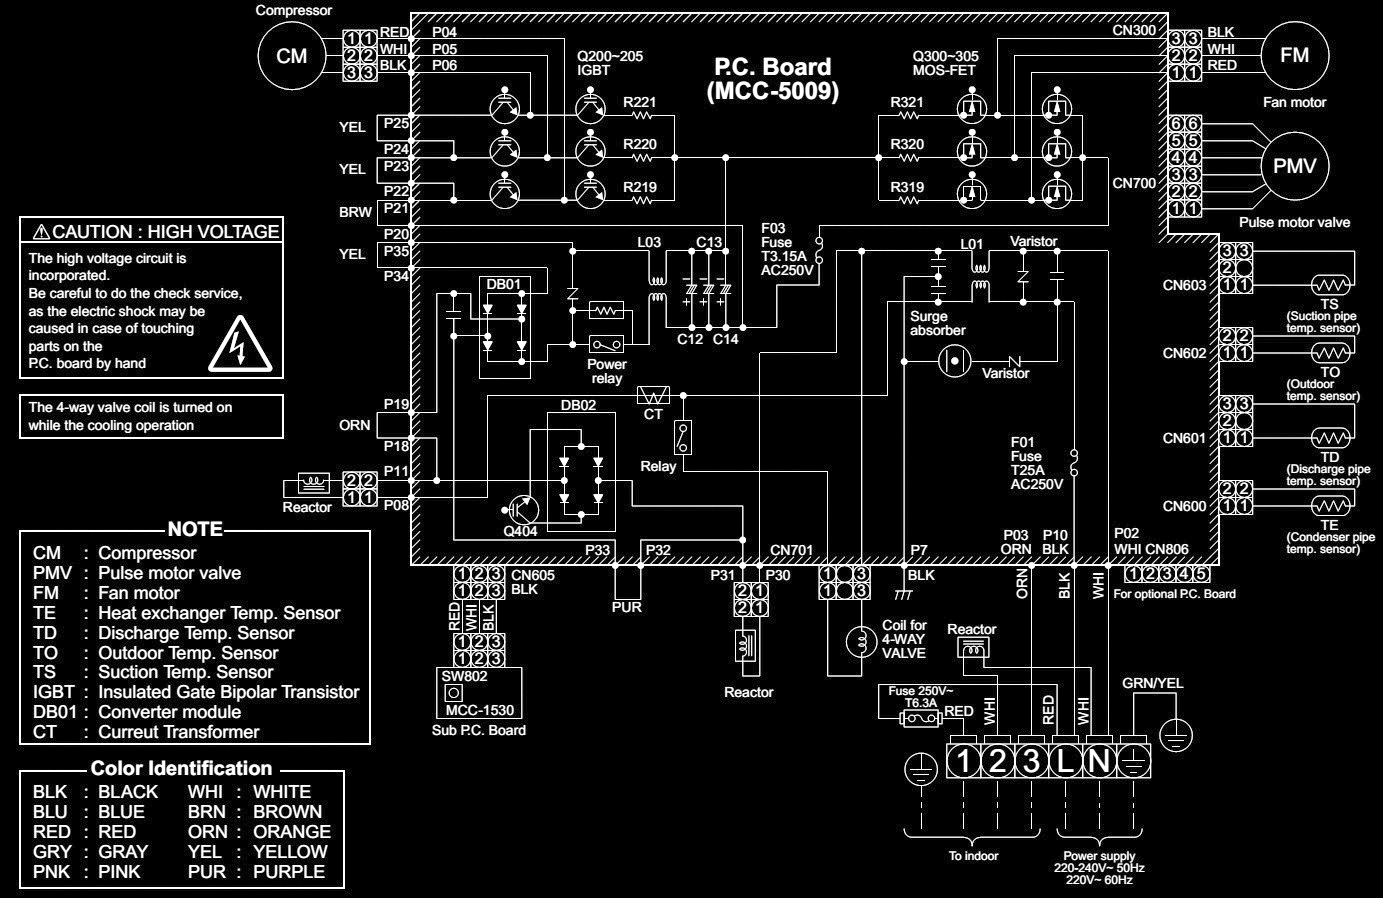 Toshiba wiring diagram electrical work wiring diagram toshiba wiring diagram images gallery cheapraybanclubmaster Images